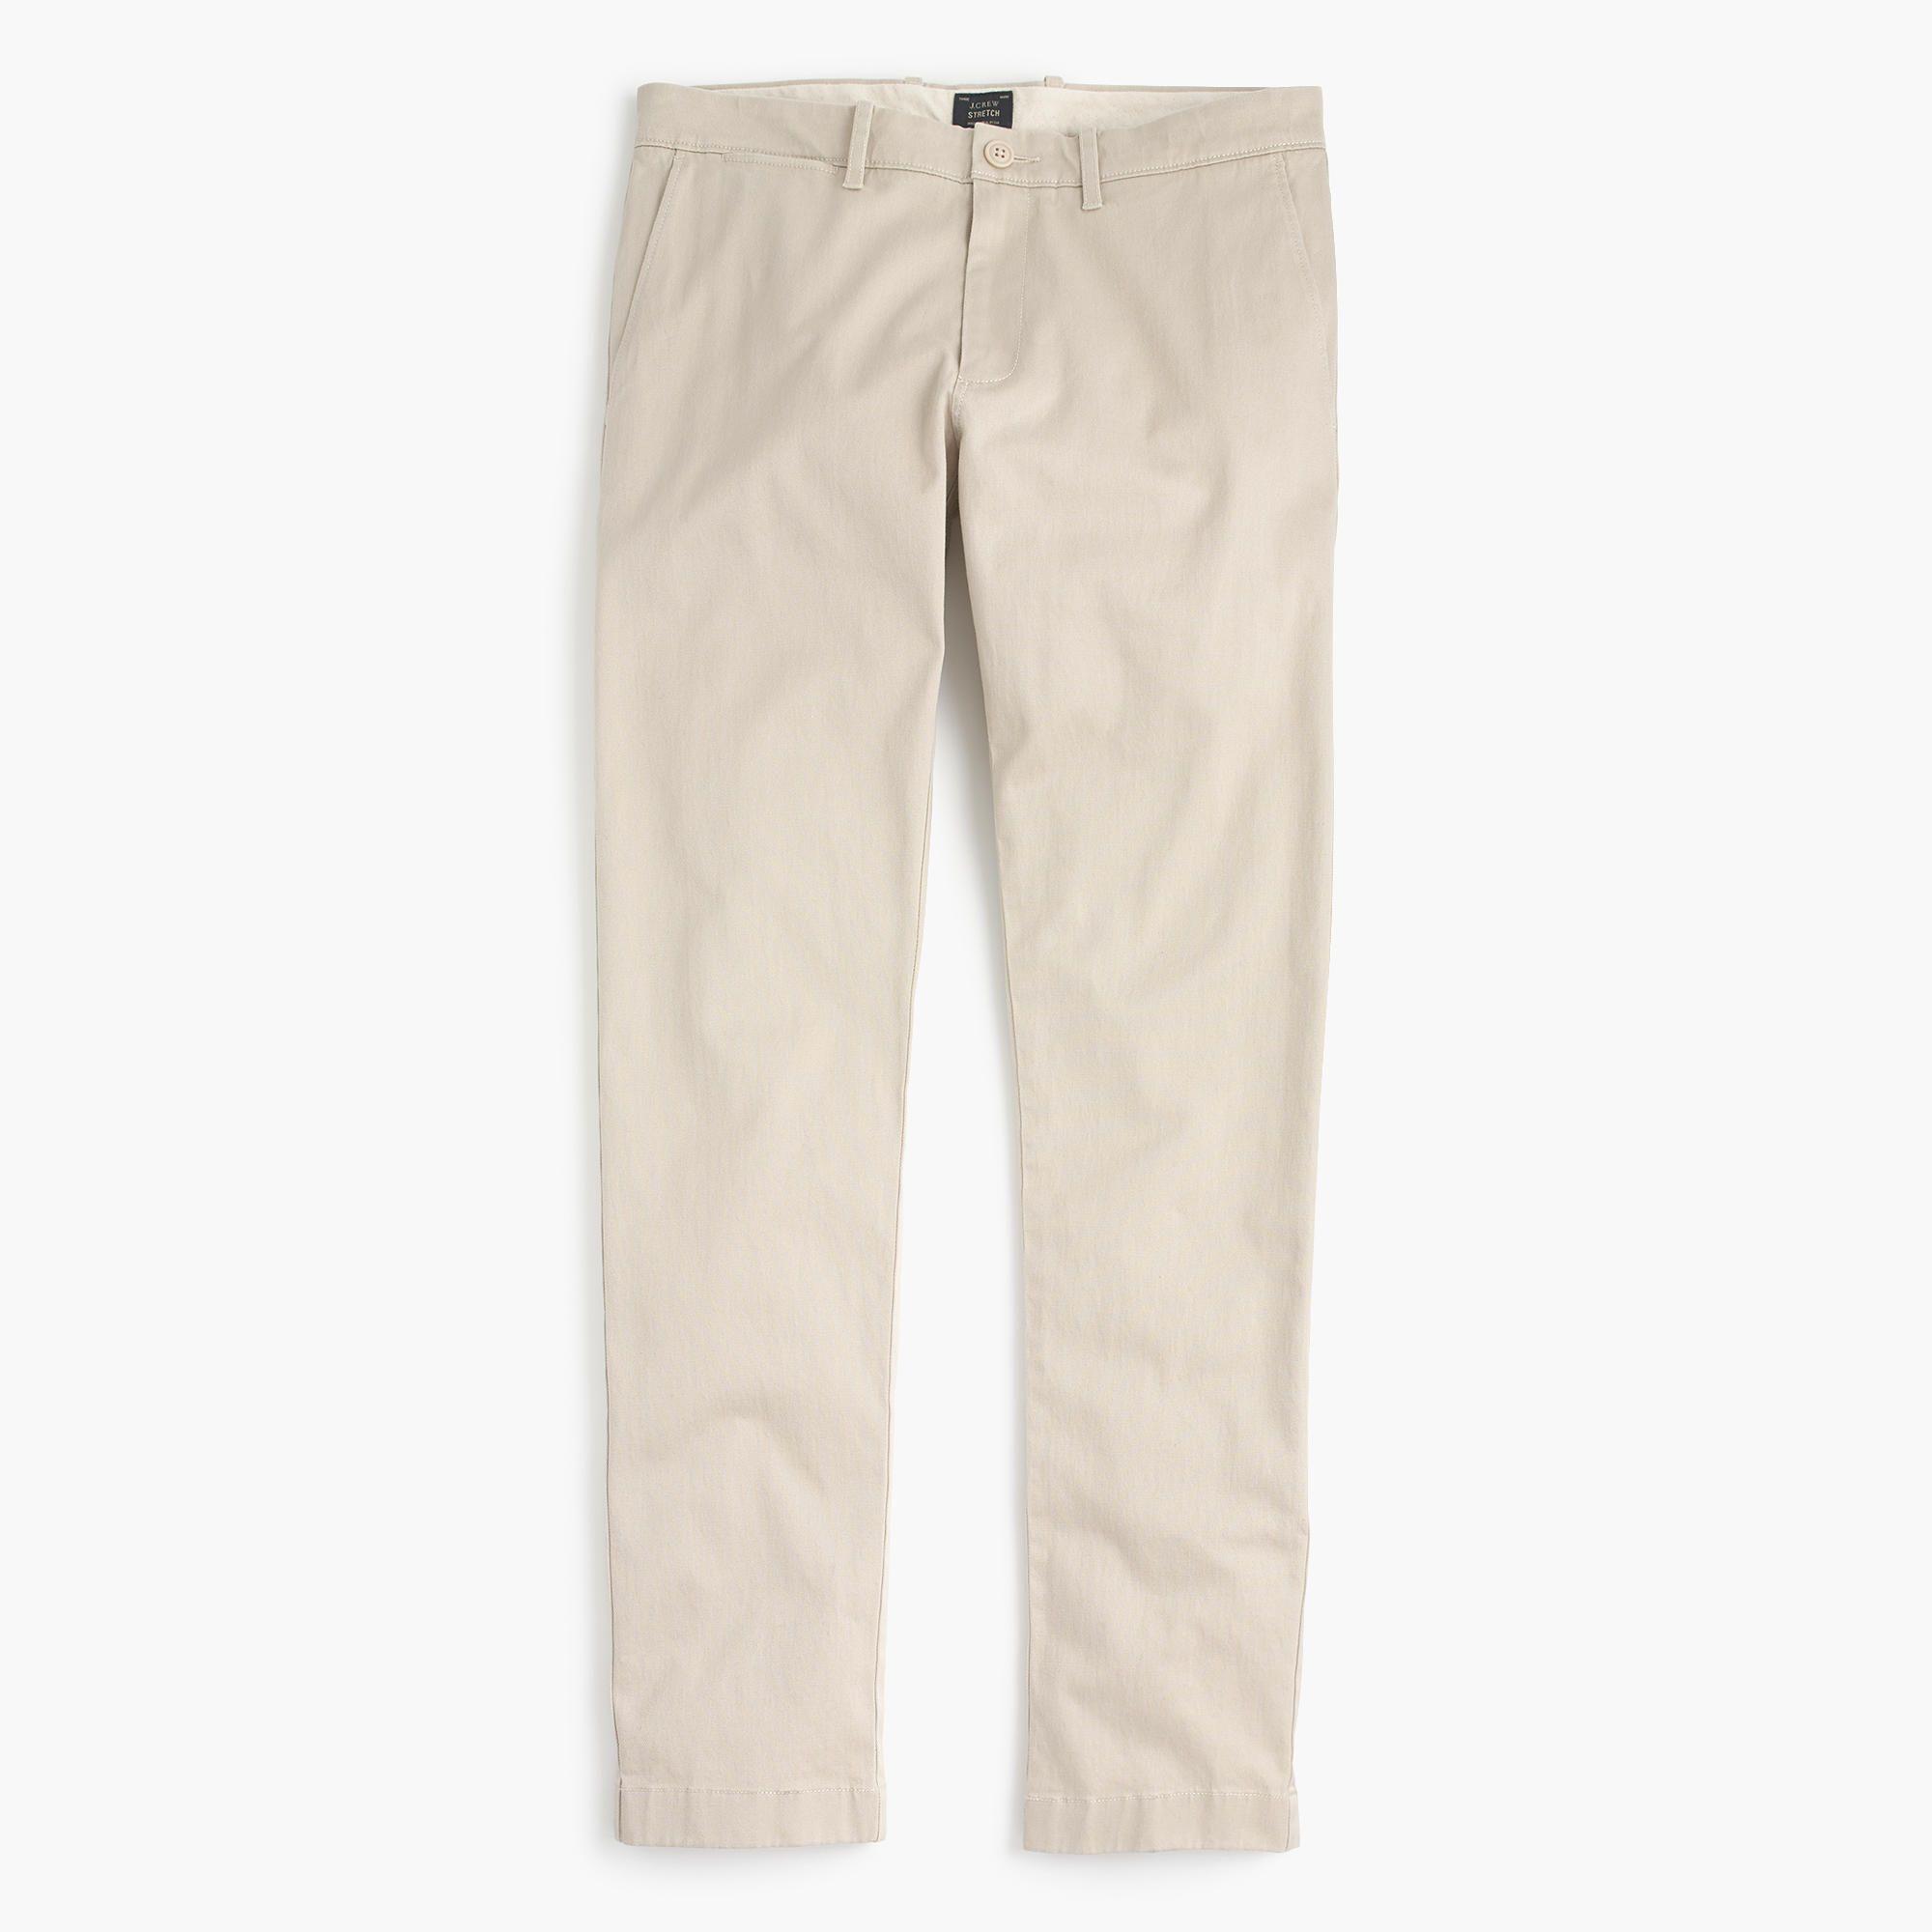 ffe6d0c60d J.Crew - 484 Slim-fit pant in stretch chino WHITE | Kirksey & Owen ...